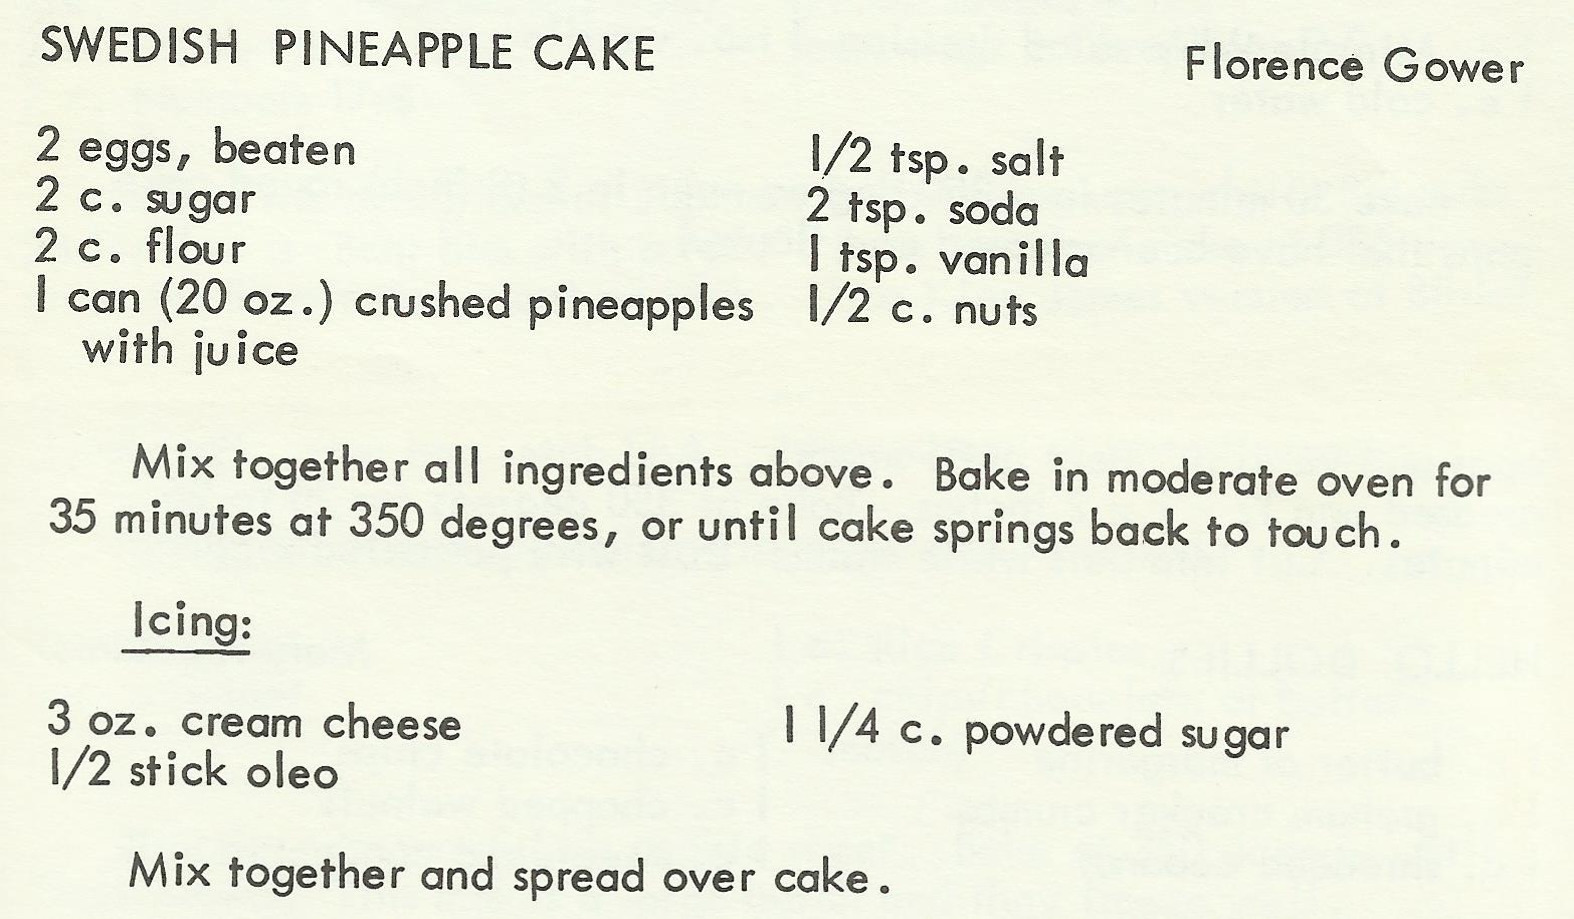 Swedish Pineapple Cake